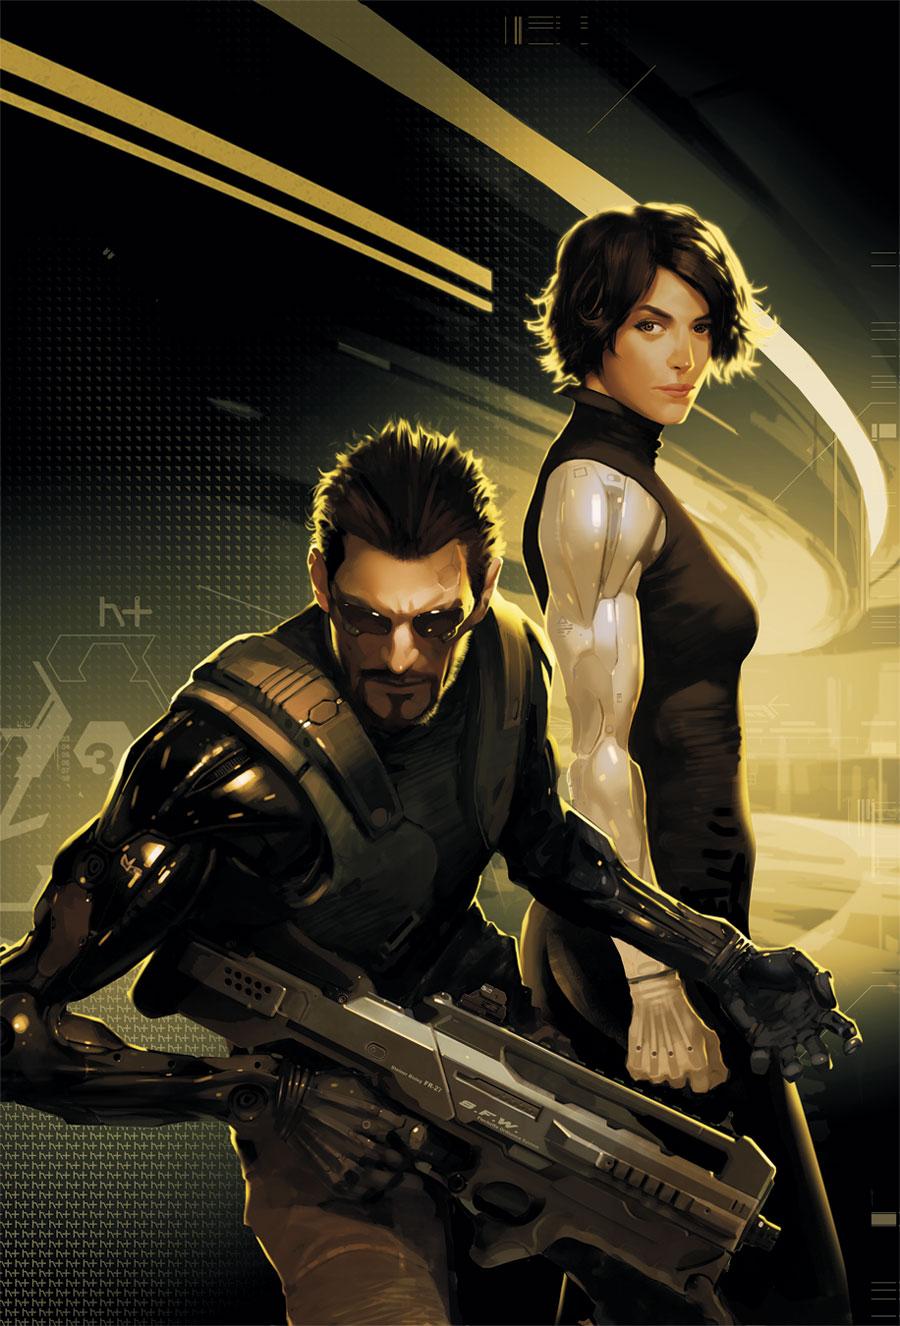 Deus Ex: Human Revolution - Assassination Run